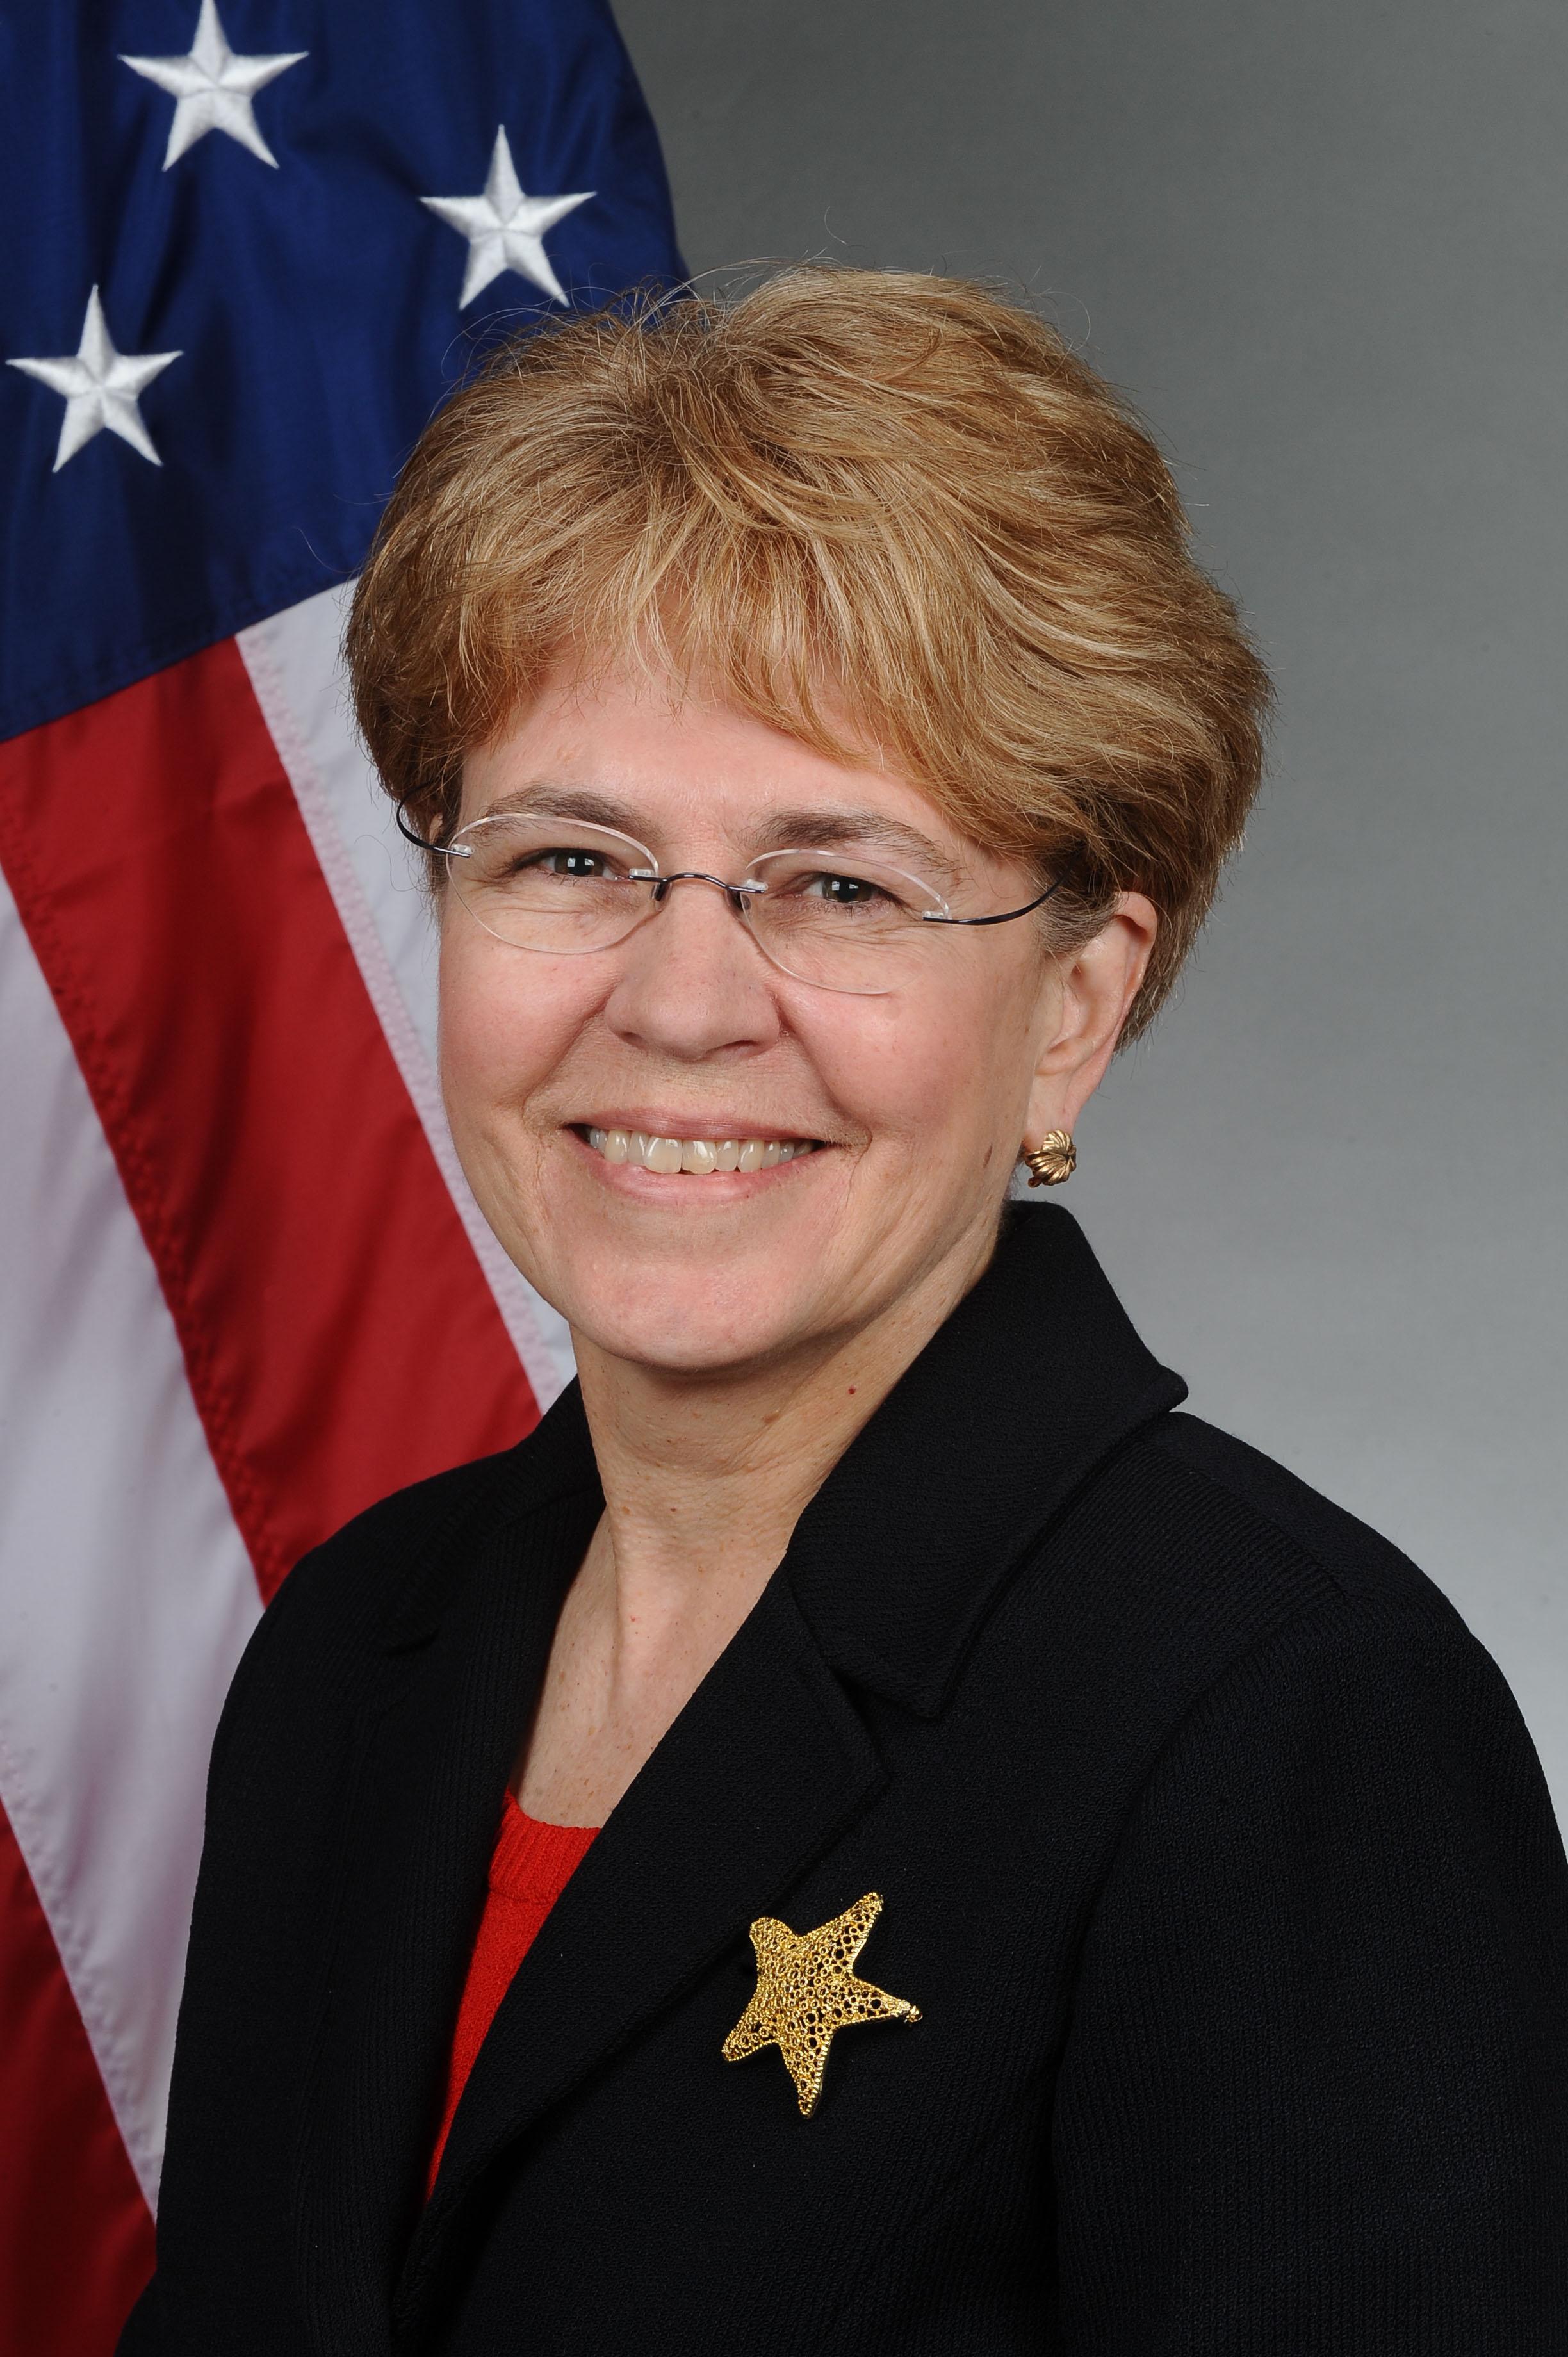 image of Jane Lubchenco